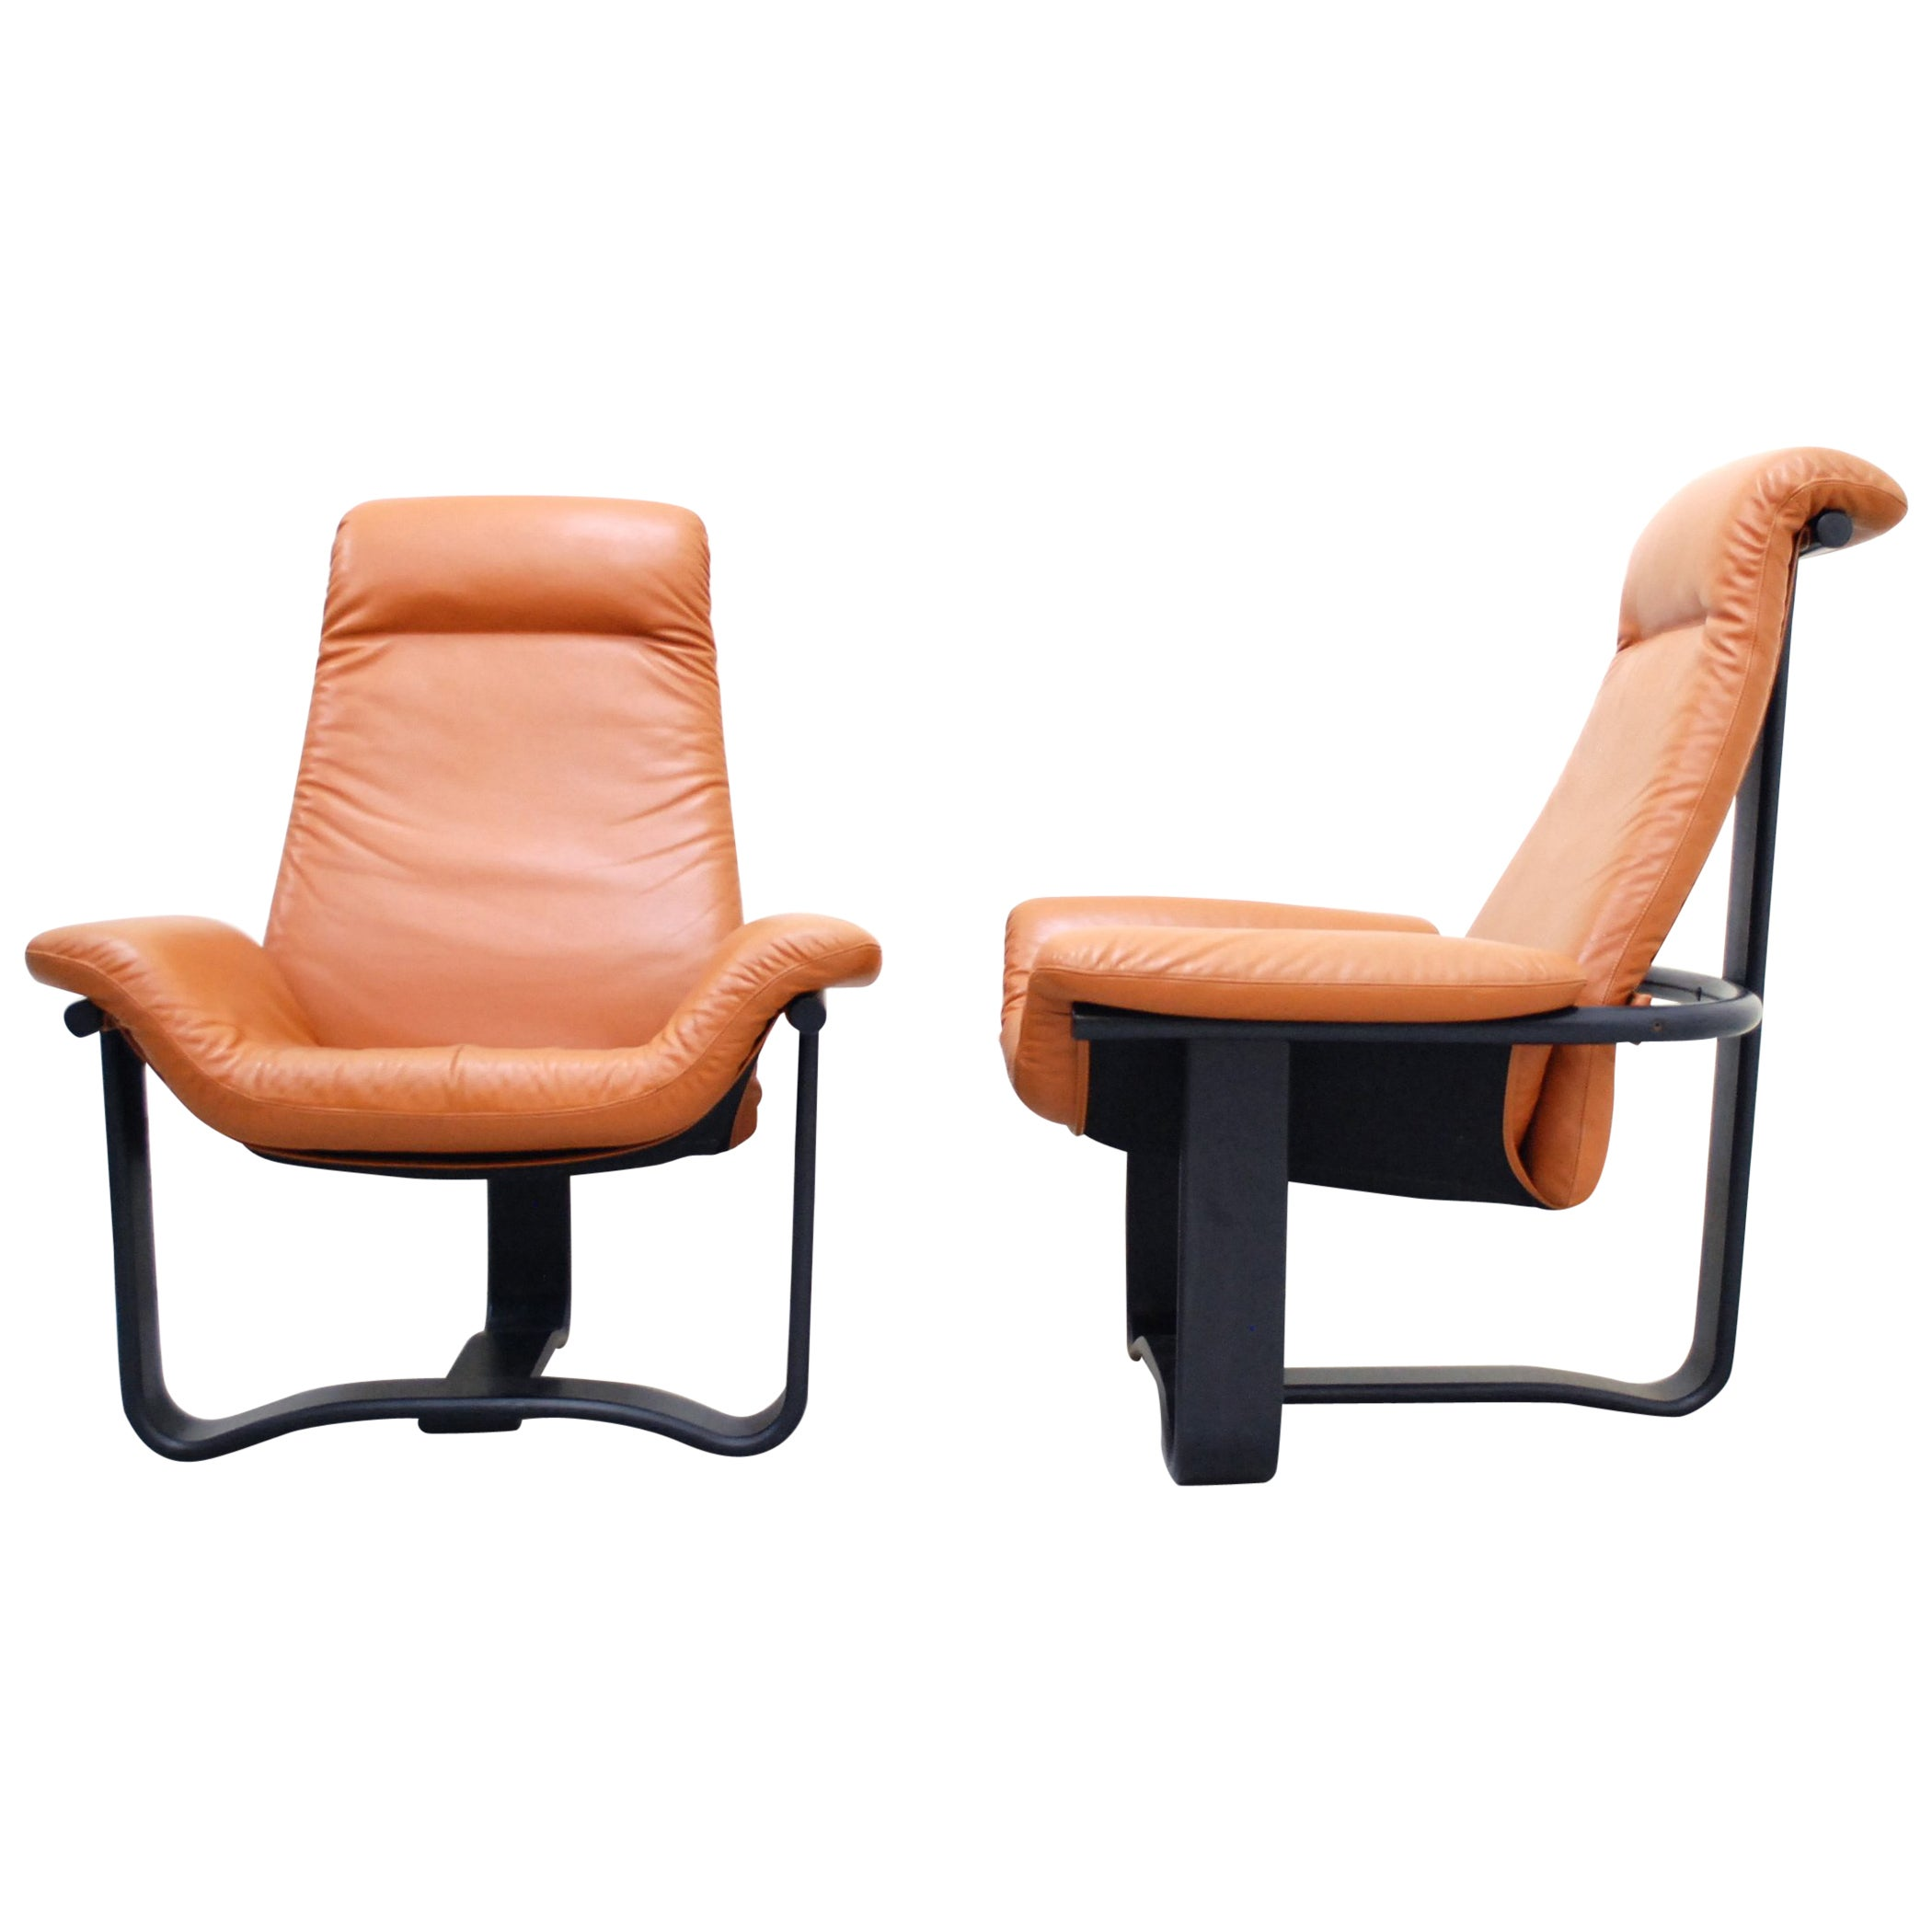 Westnofa Model Manta Cognac Leather Lounge Chair